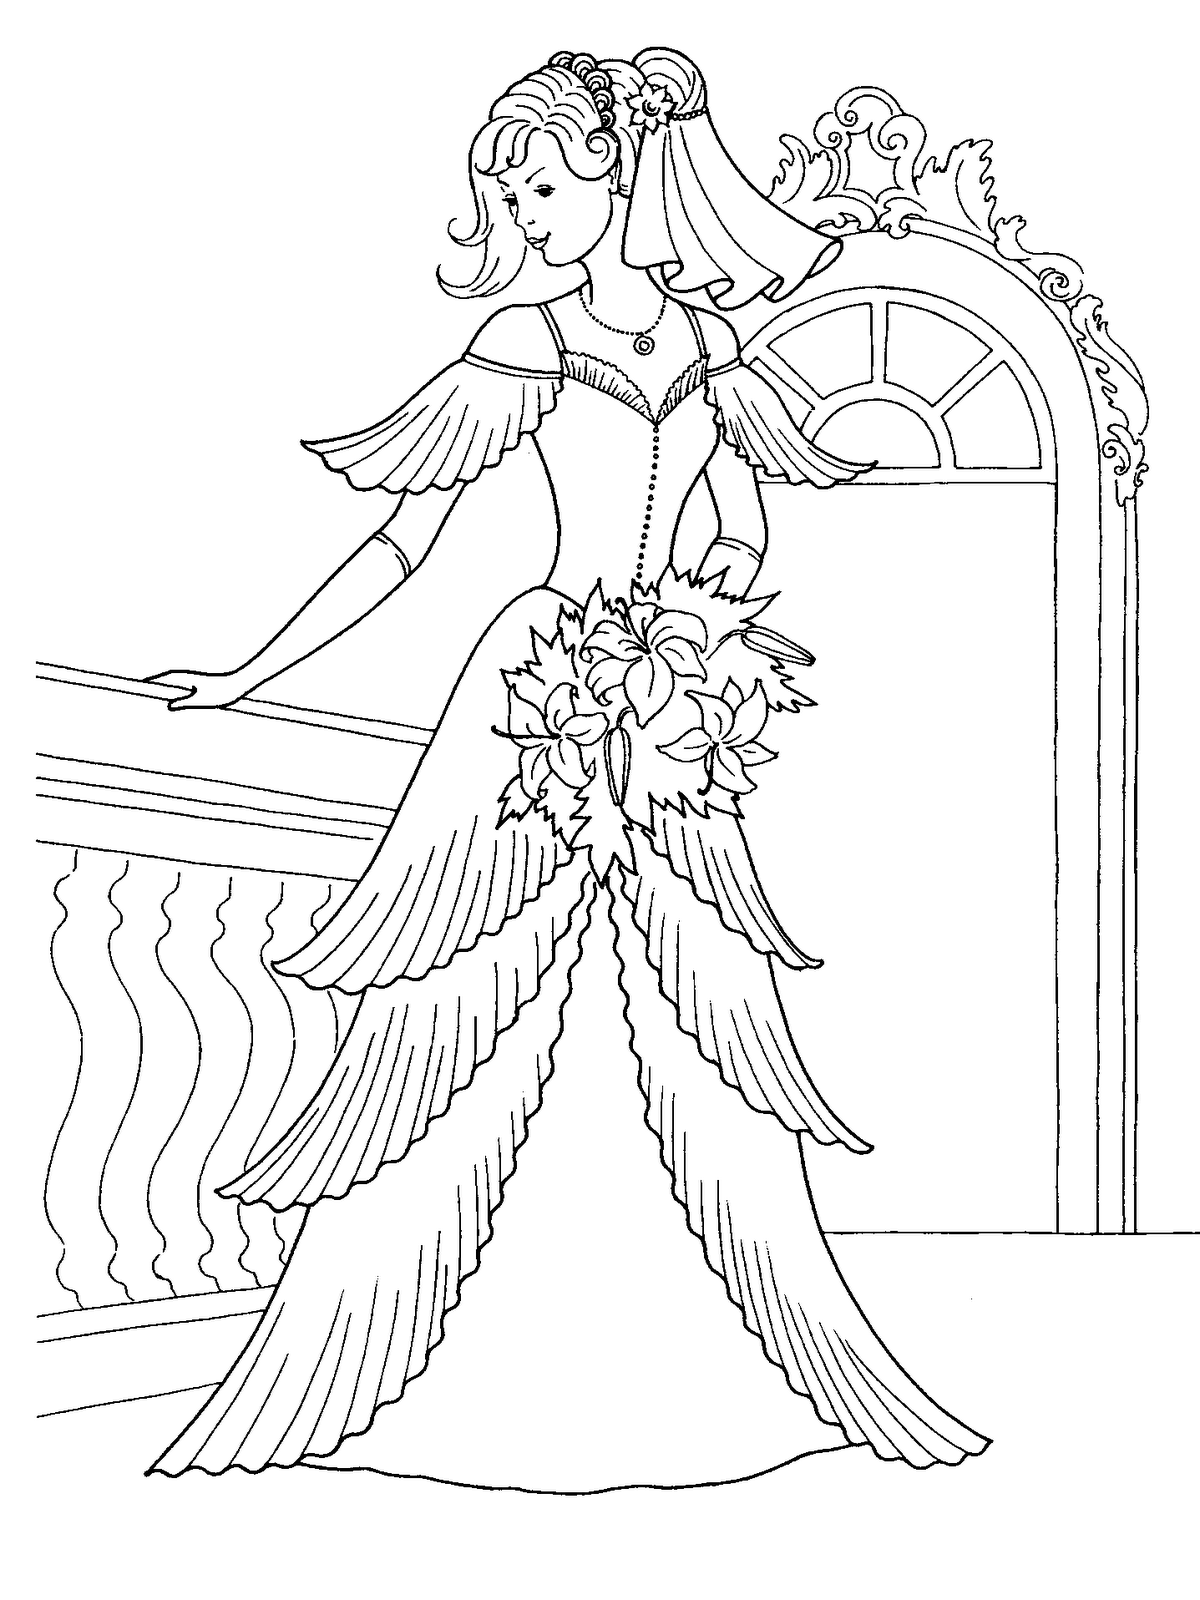 The Wedding Dresses Princess Coloring Sheet to Print ...